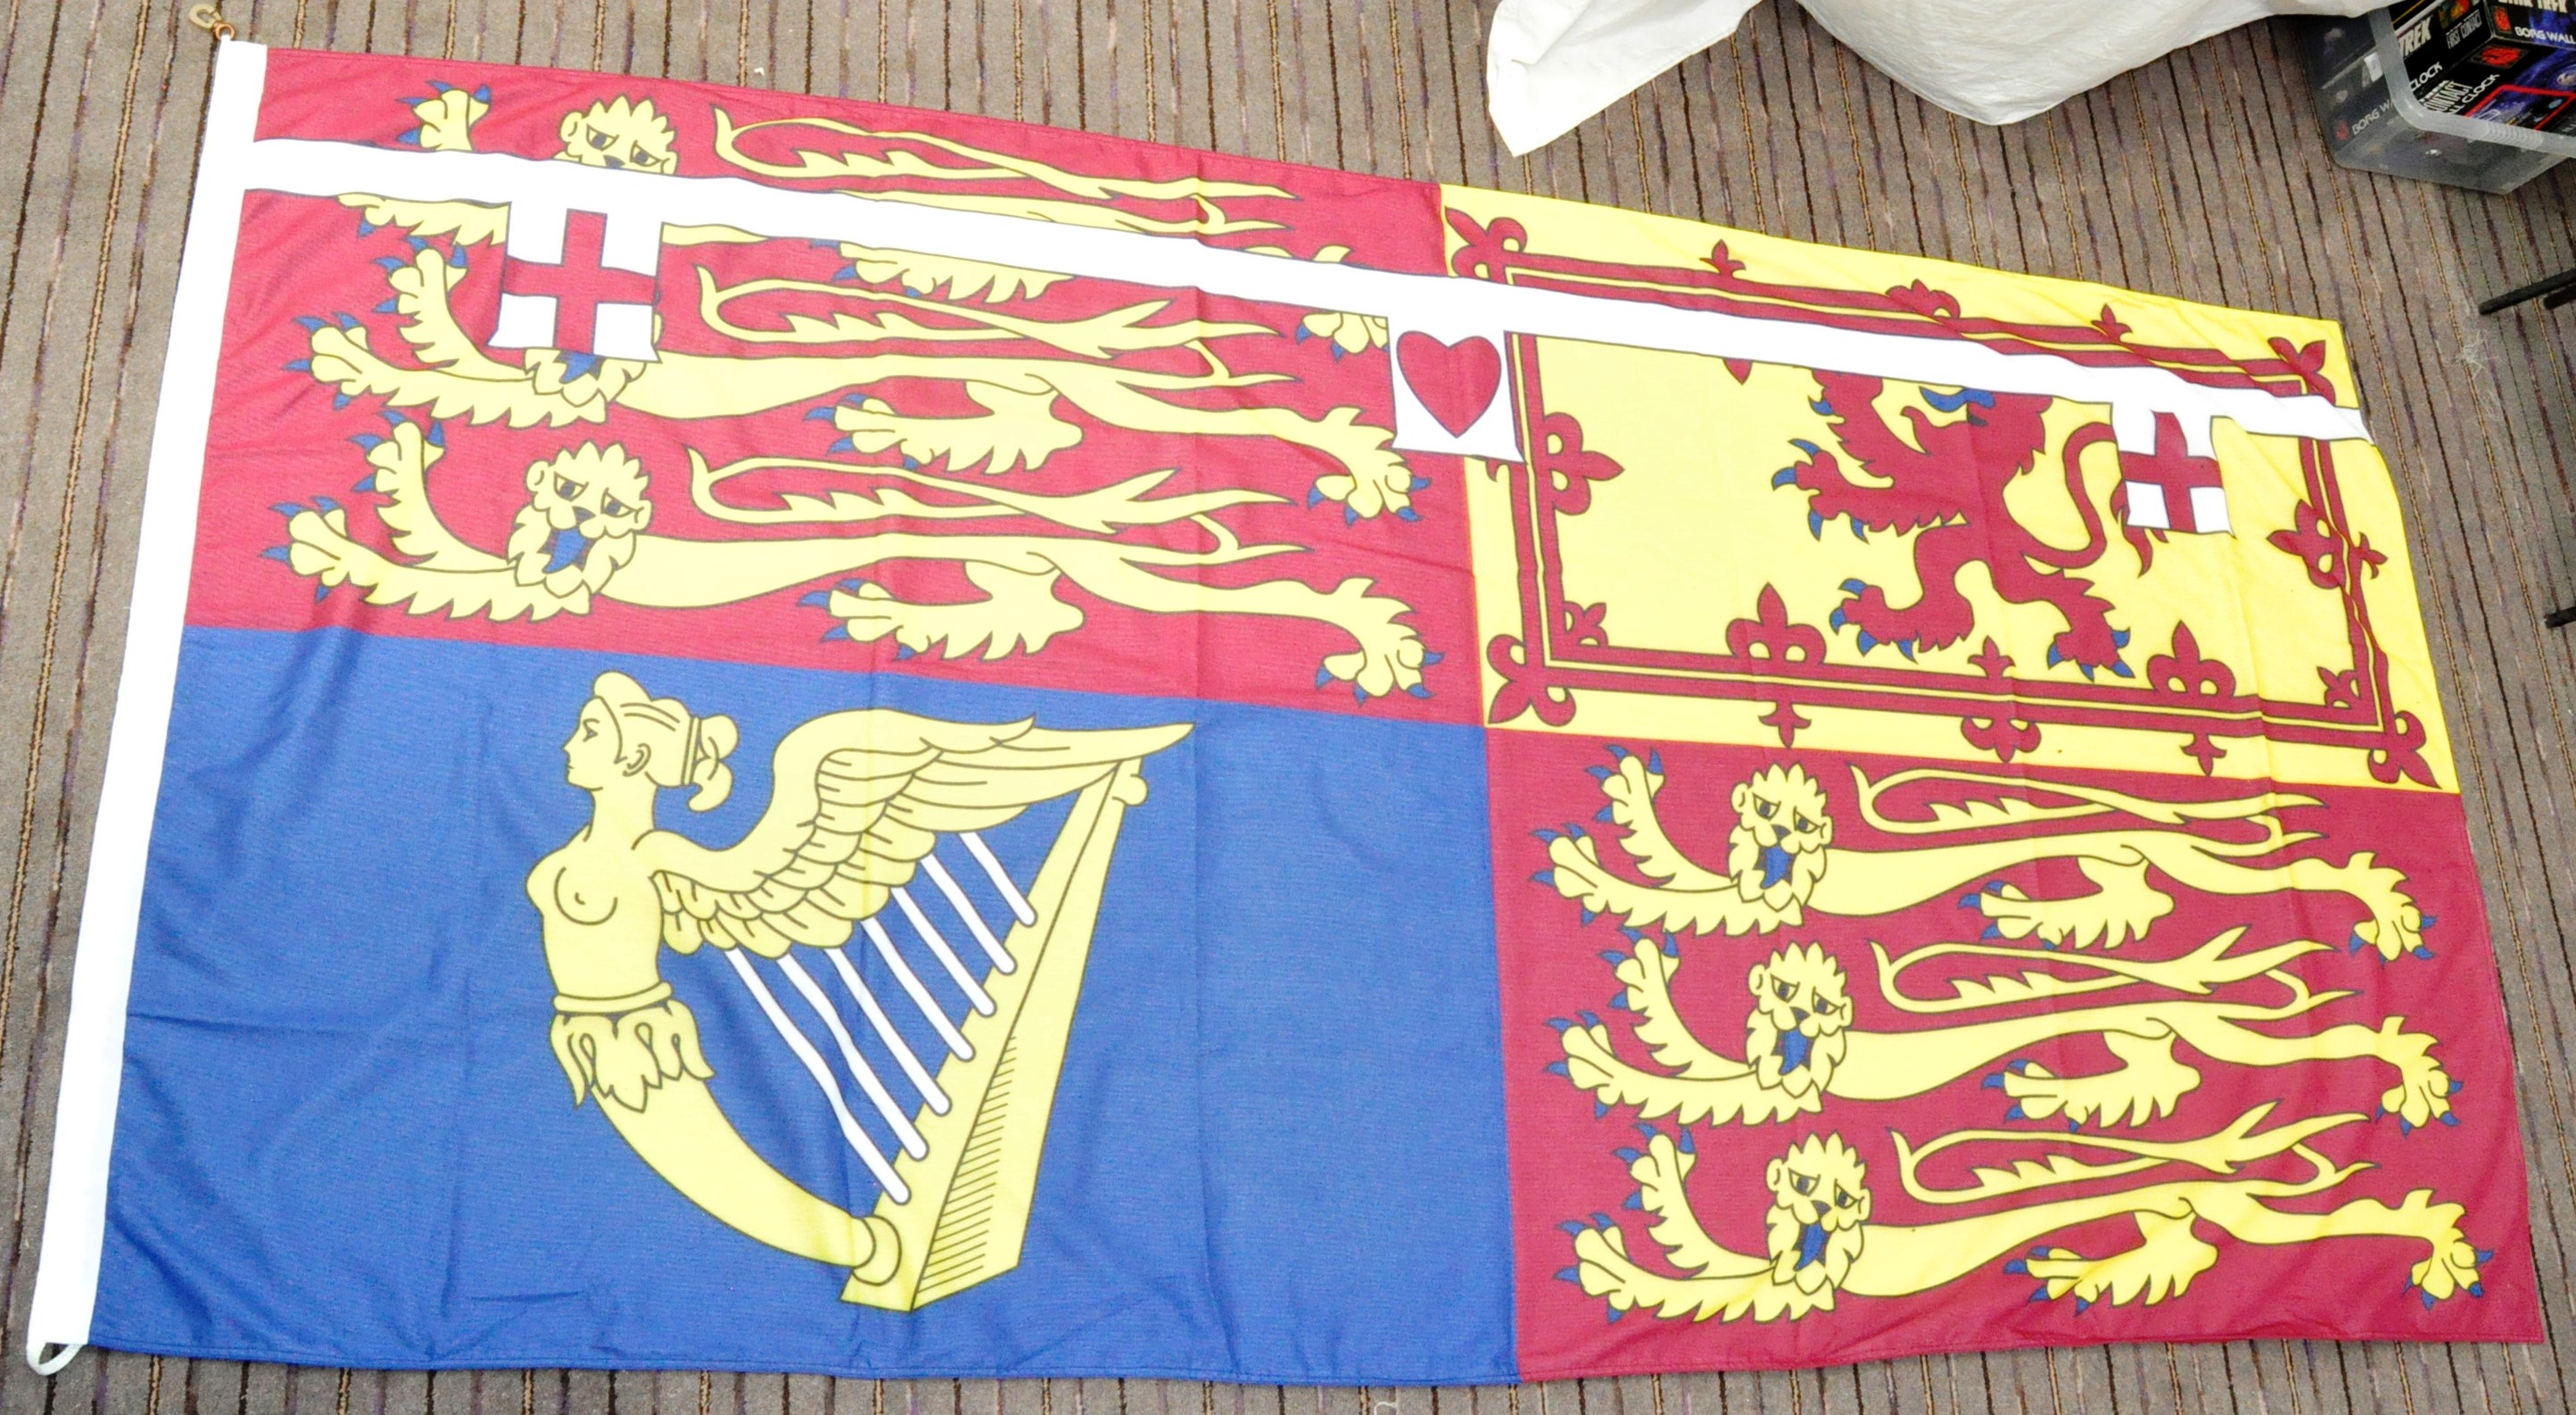 LARGE ROYAL STANDARD OF THE UNITED KINGDOM FLAG